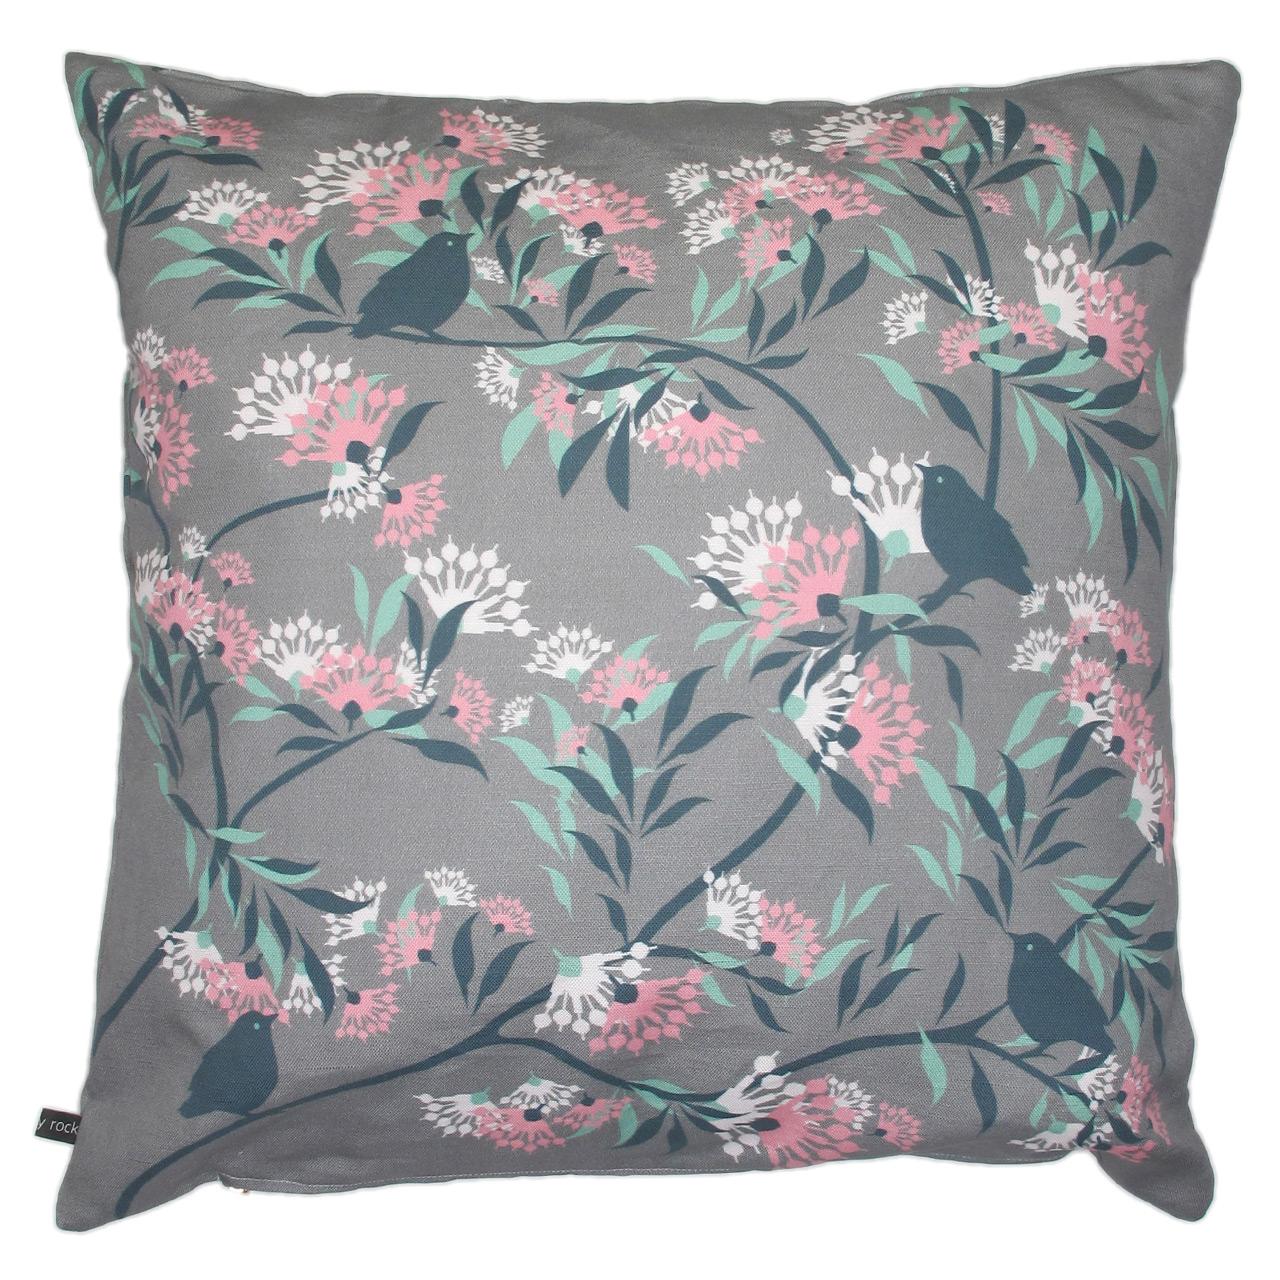 Kissenbezug  Blumen/Vogel rose-bege